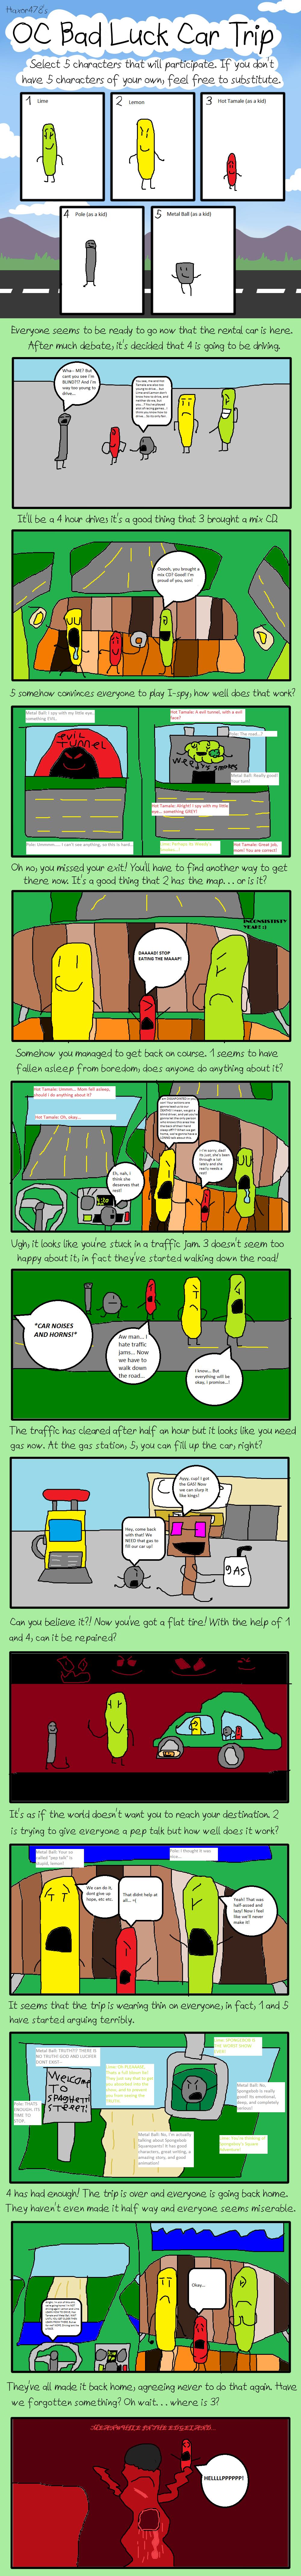 Bad Luck Car Trip Meme! by Kobe56299 on DeviantArt